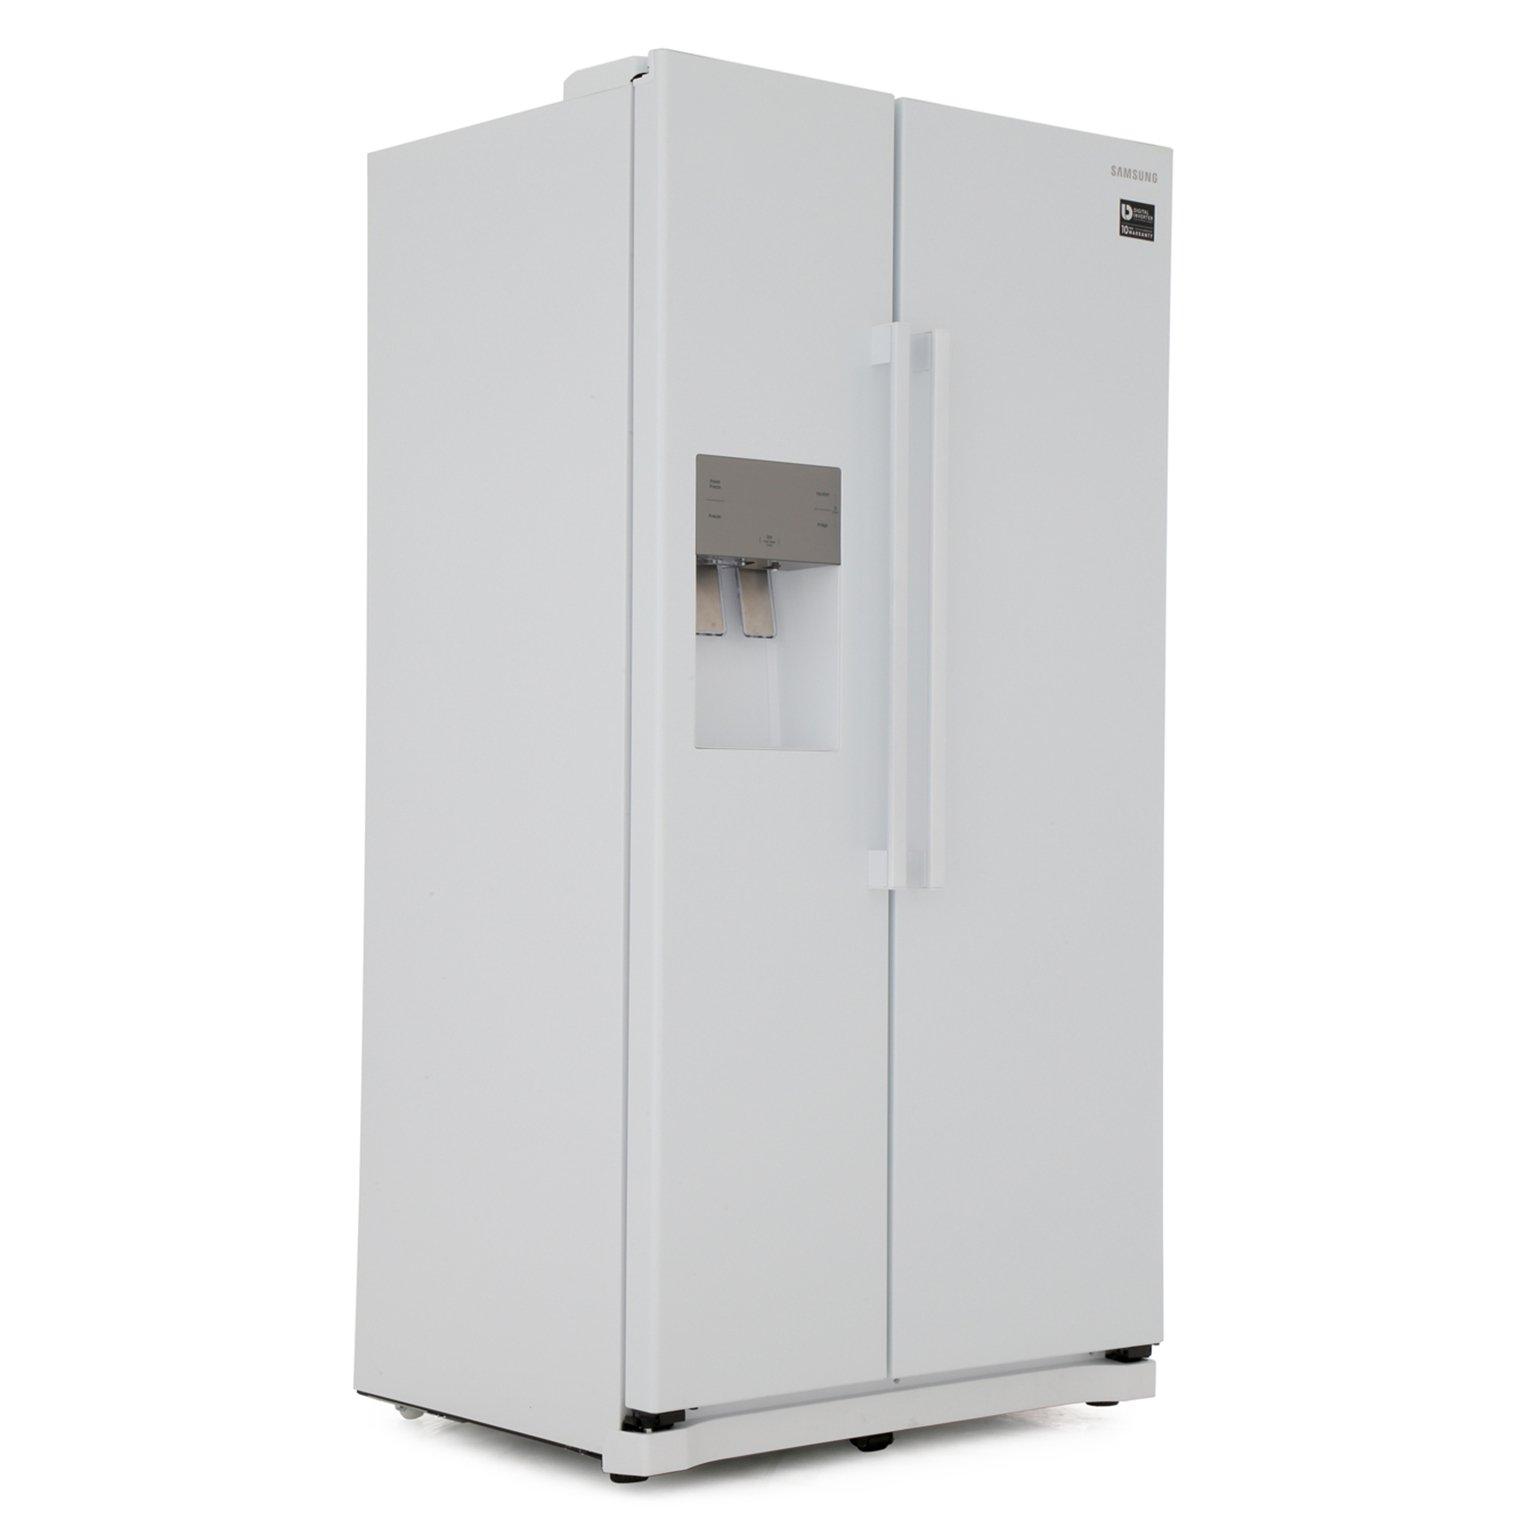 Samsung RS50N3513WW/EU American Fridge Freezer